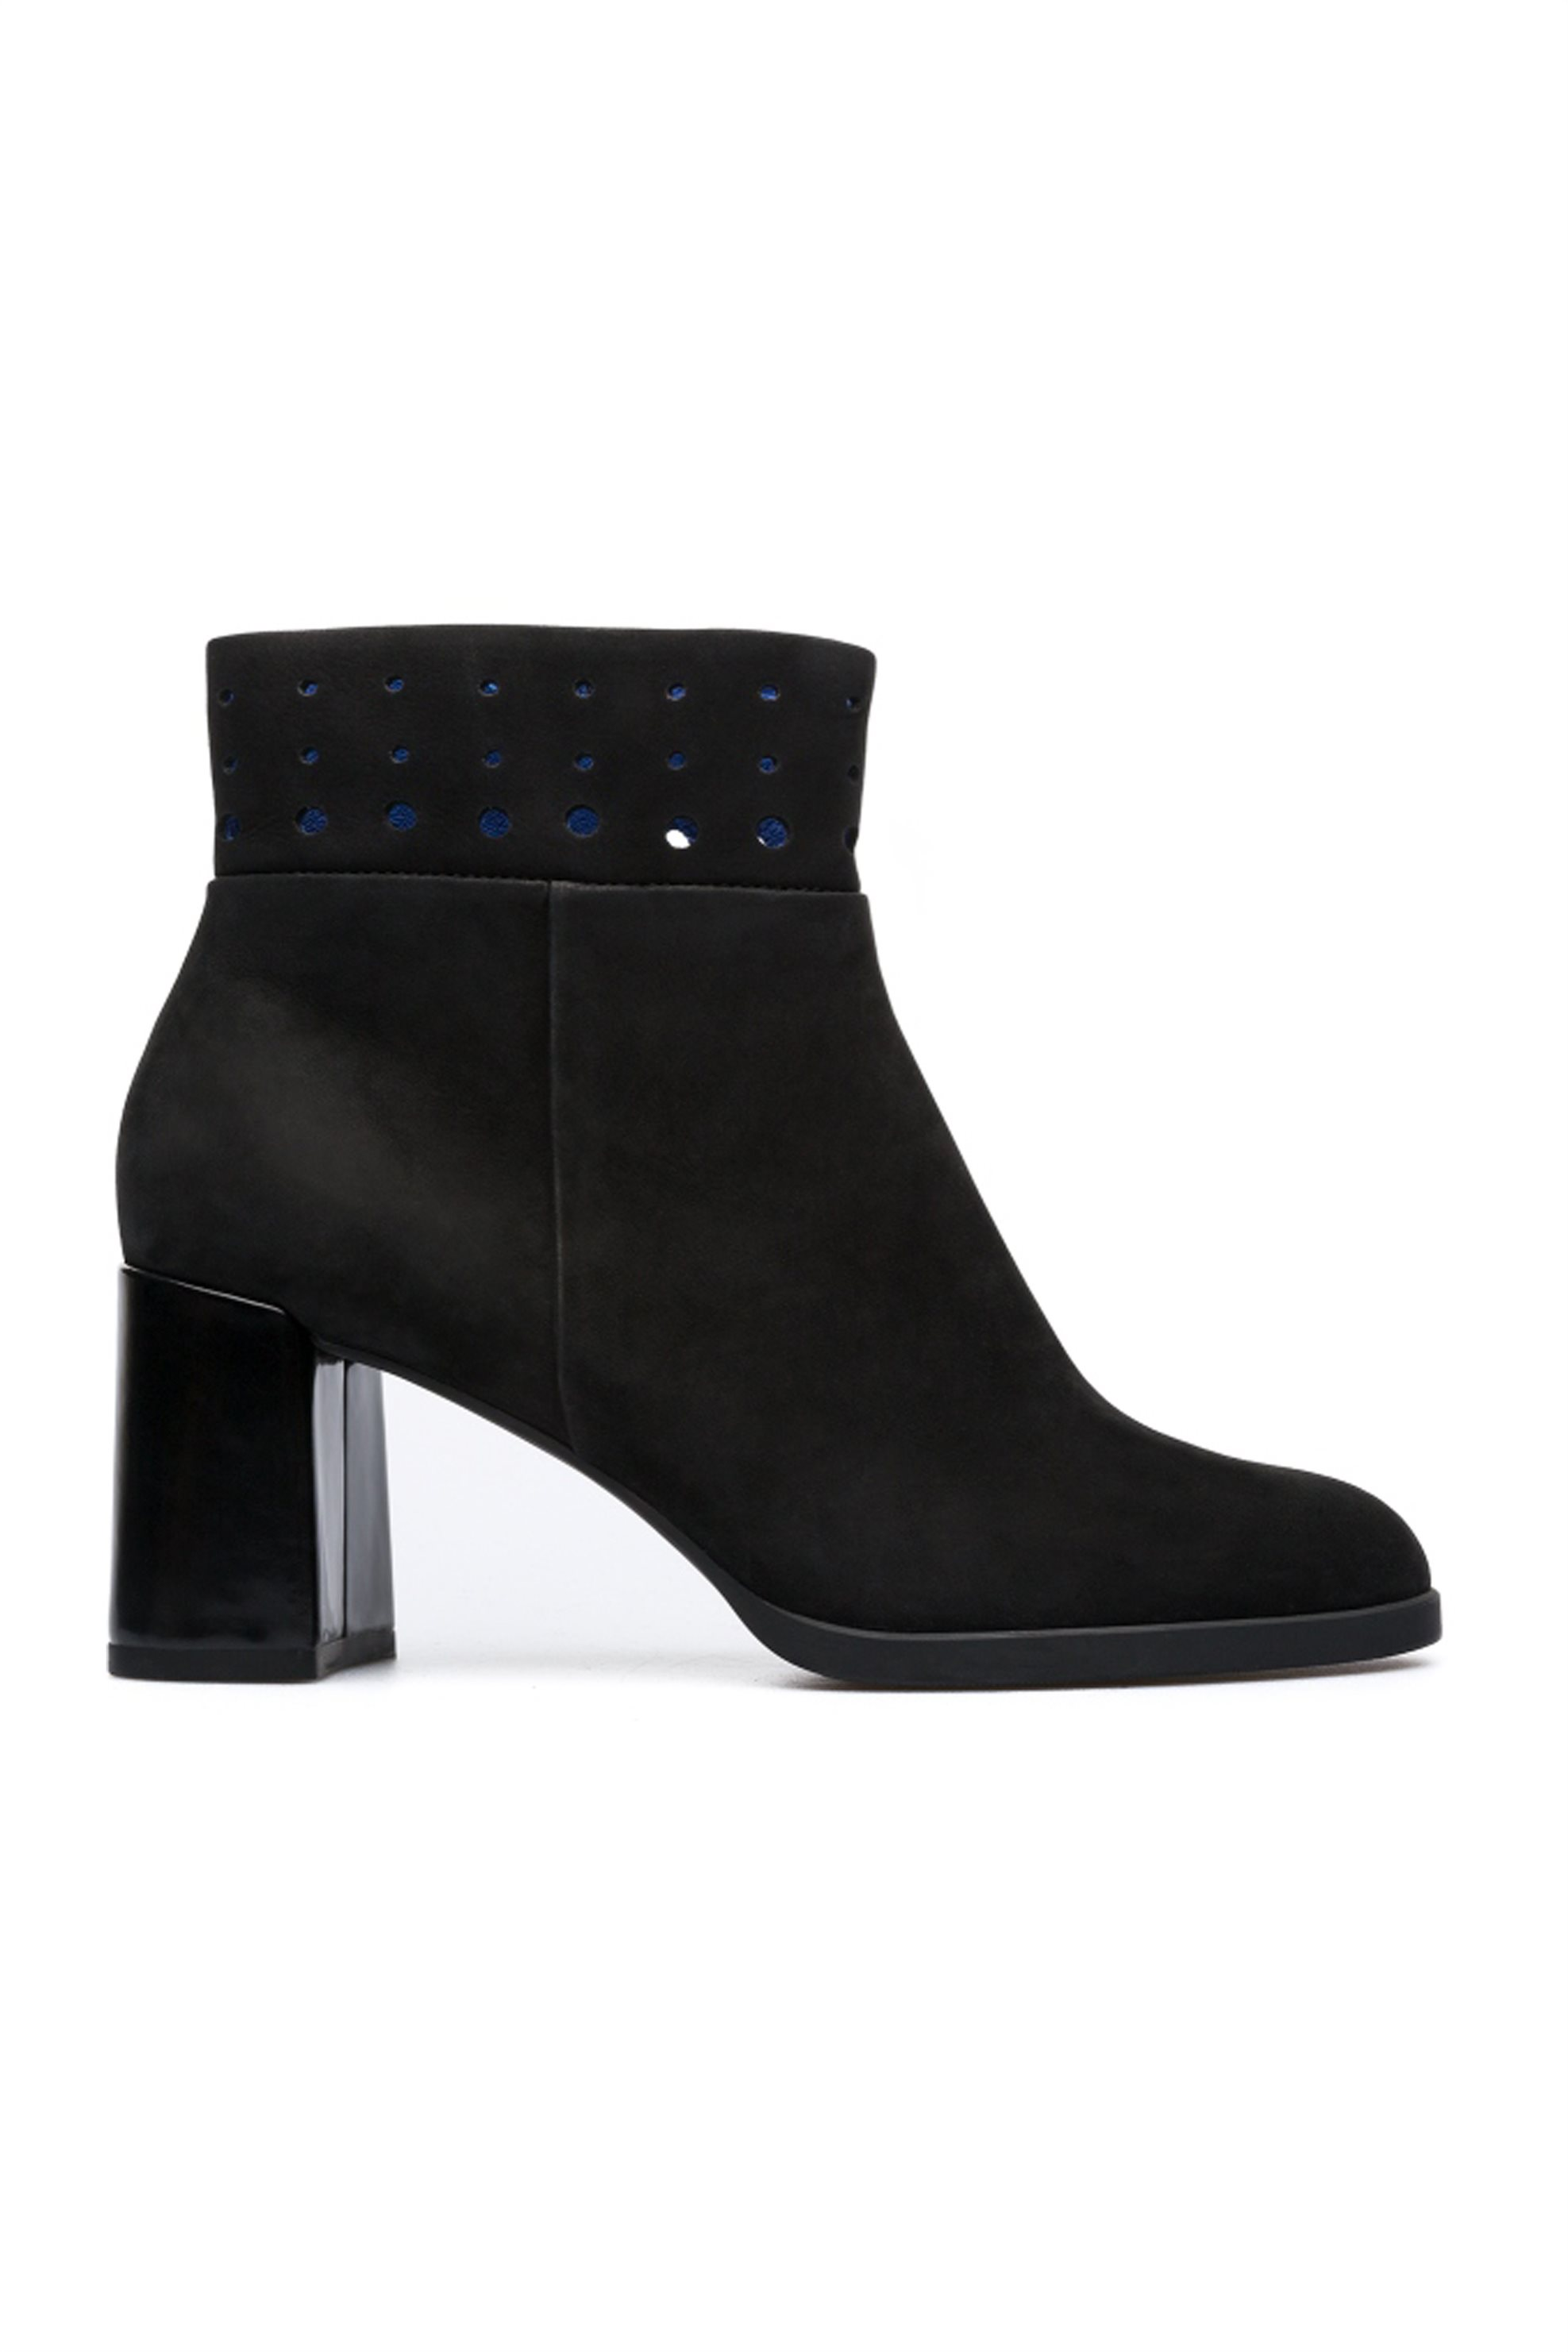 Camper γυναικεία μποτάκια σουέτ μαύρα με τακούνι Twins - K400346-001 - Μαύρο γυναικα   παπουτσια   μποτάκια